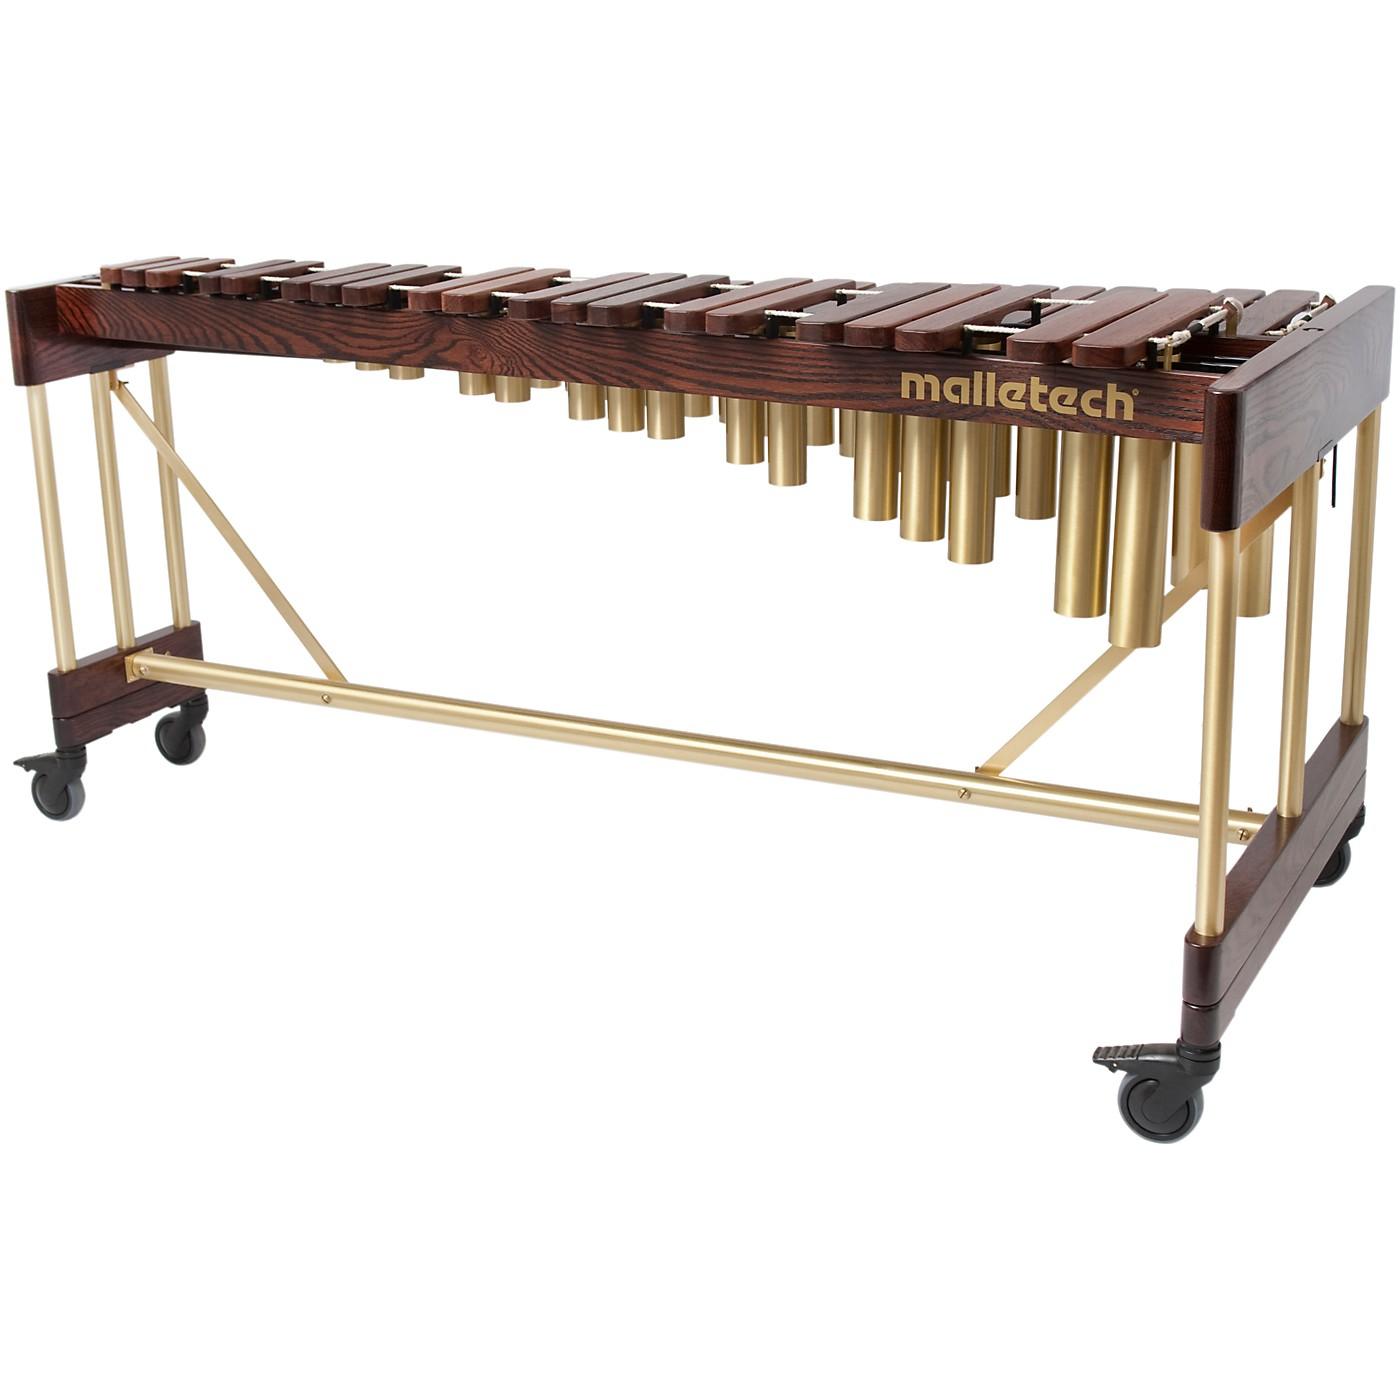 Malletech Hgt. Adjustable Concert Xylophone thumbnail